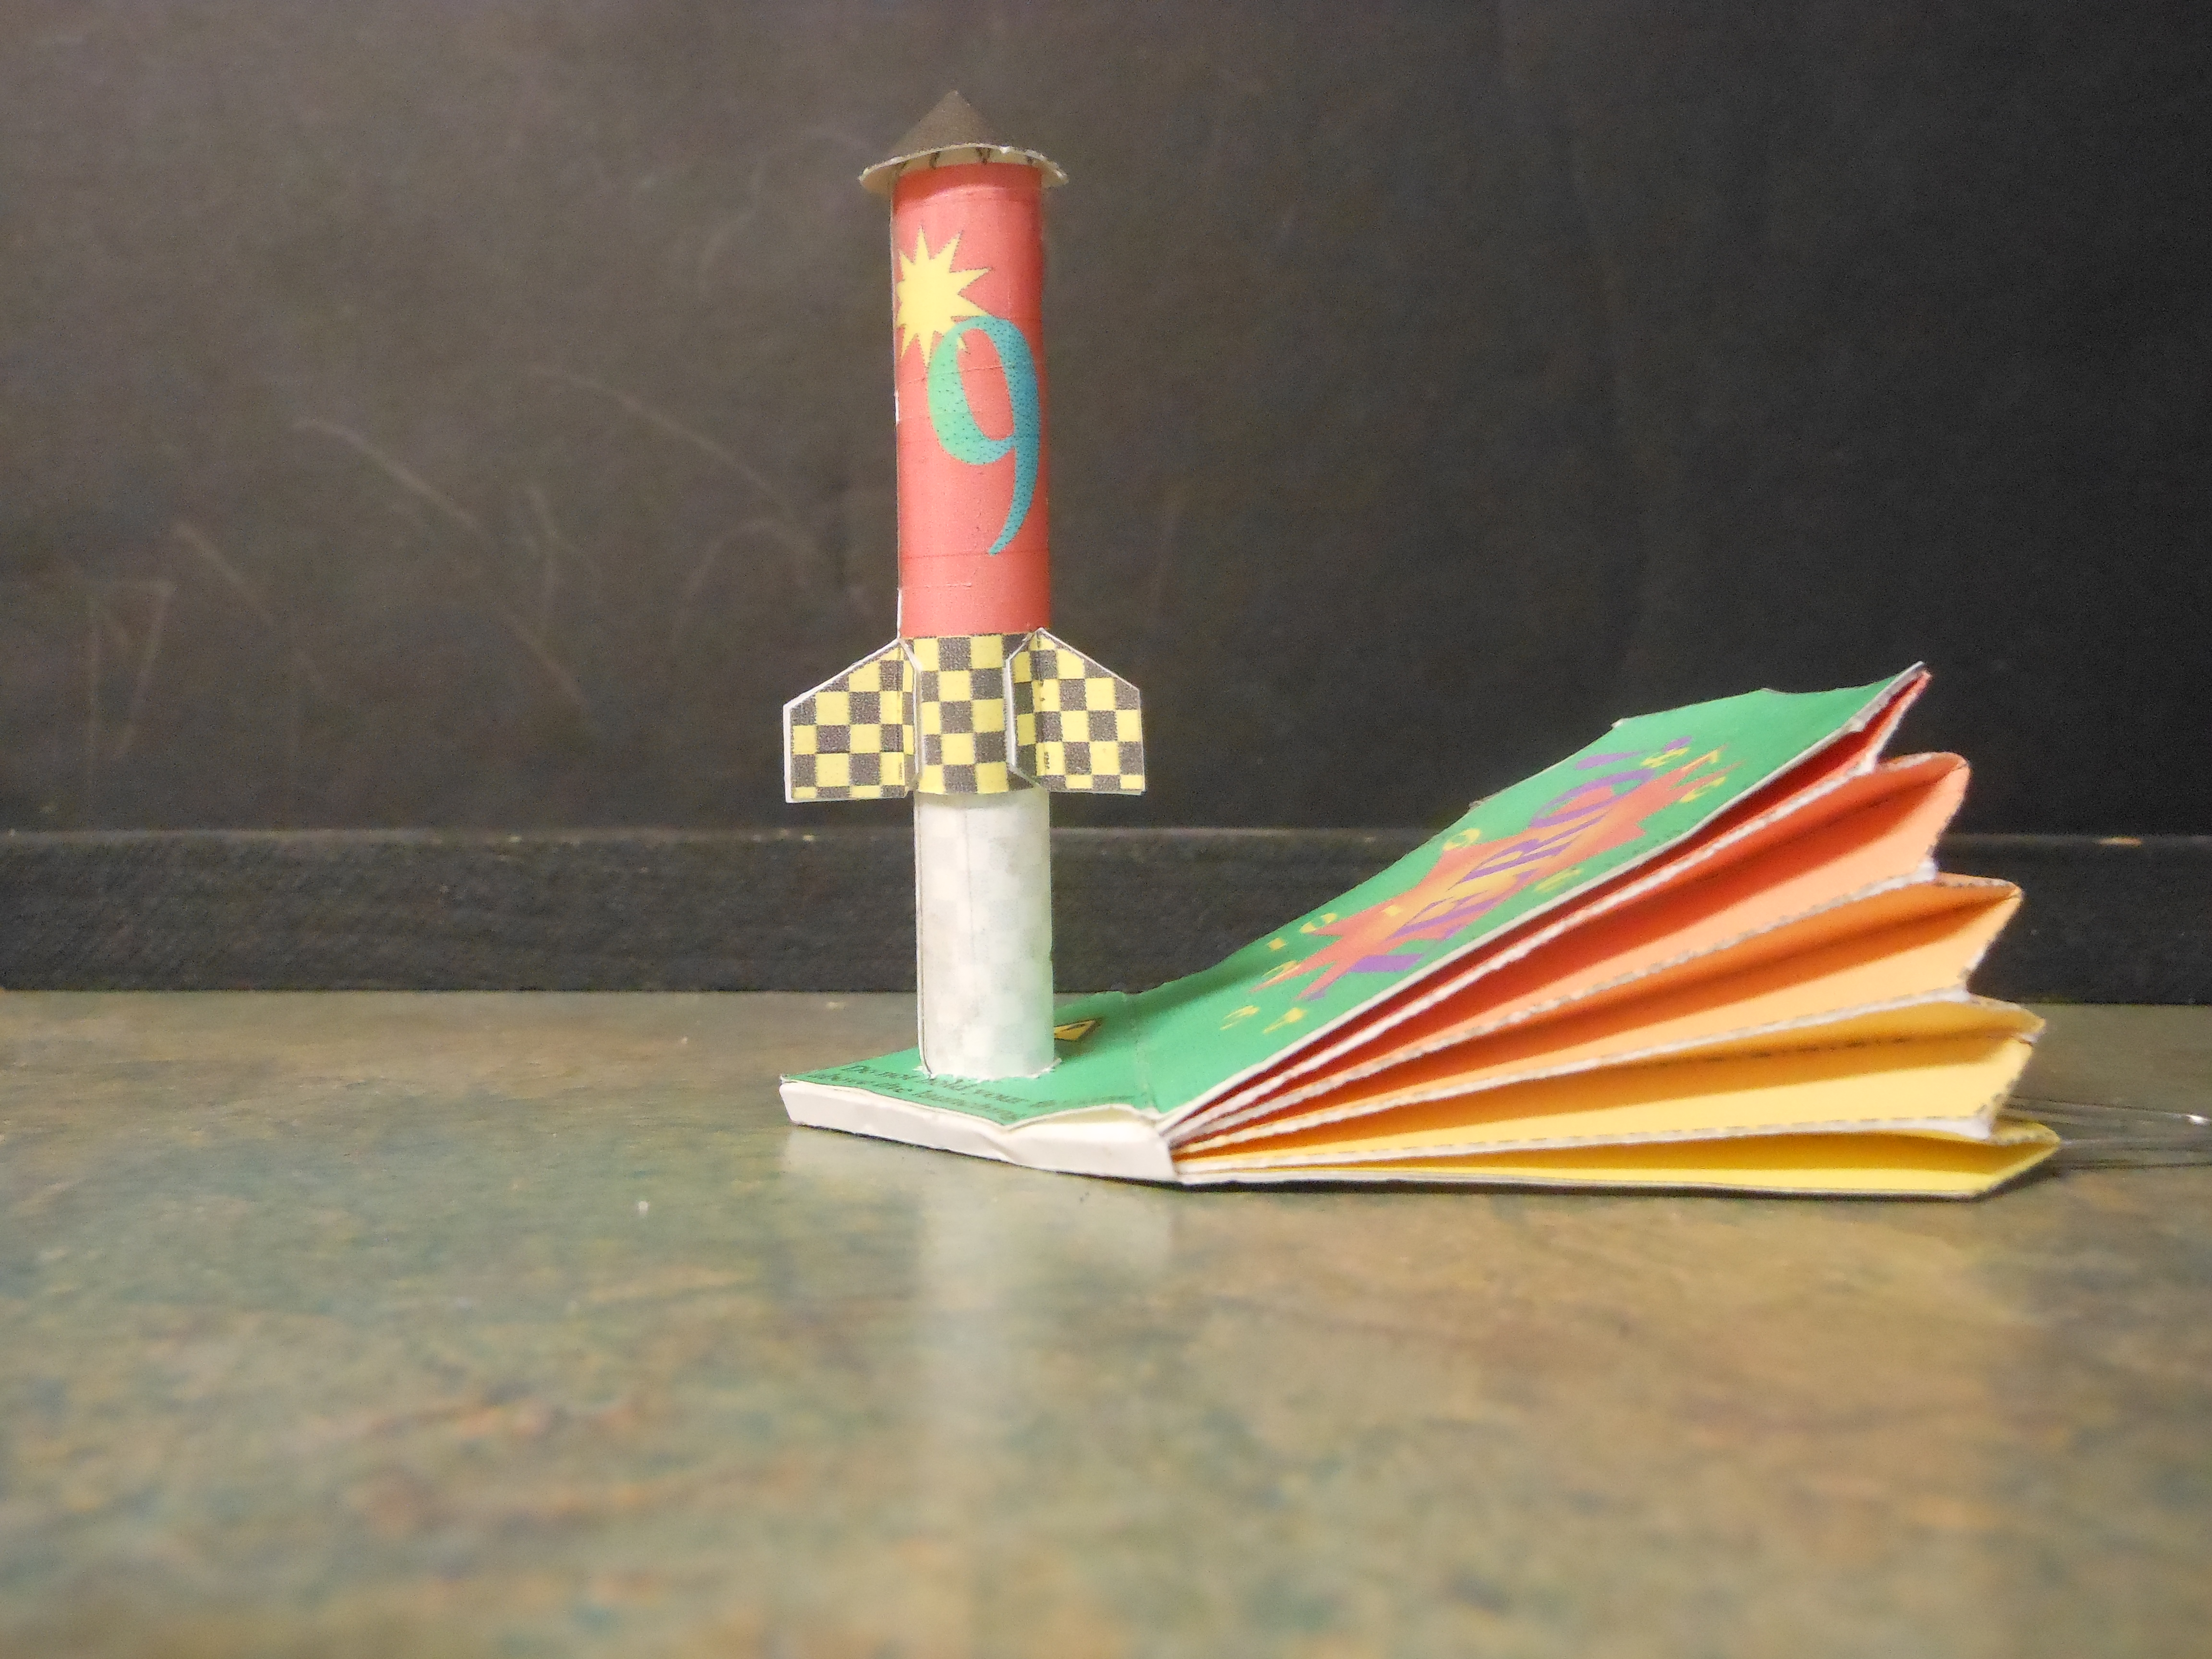 Build a Paper Rocket and Paper Launcher